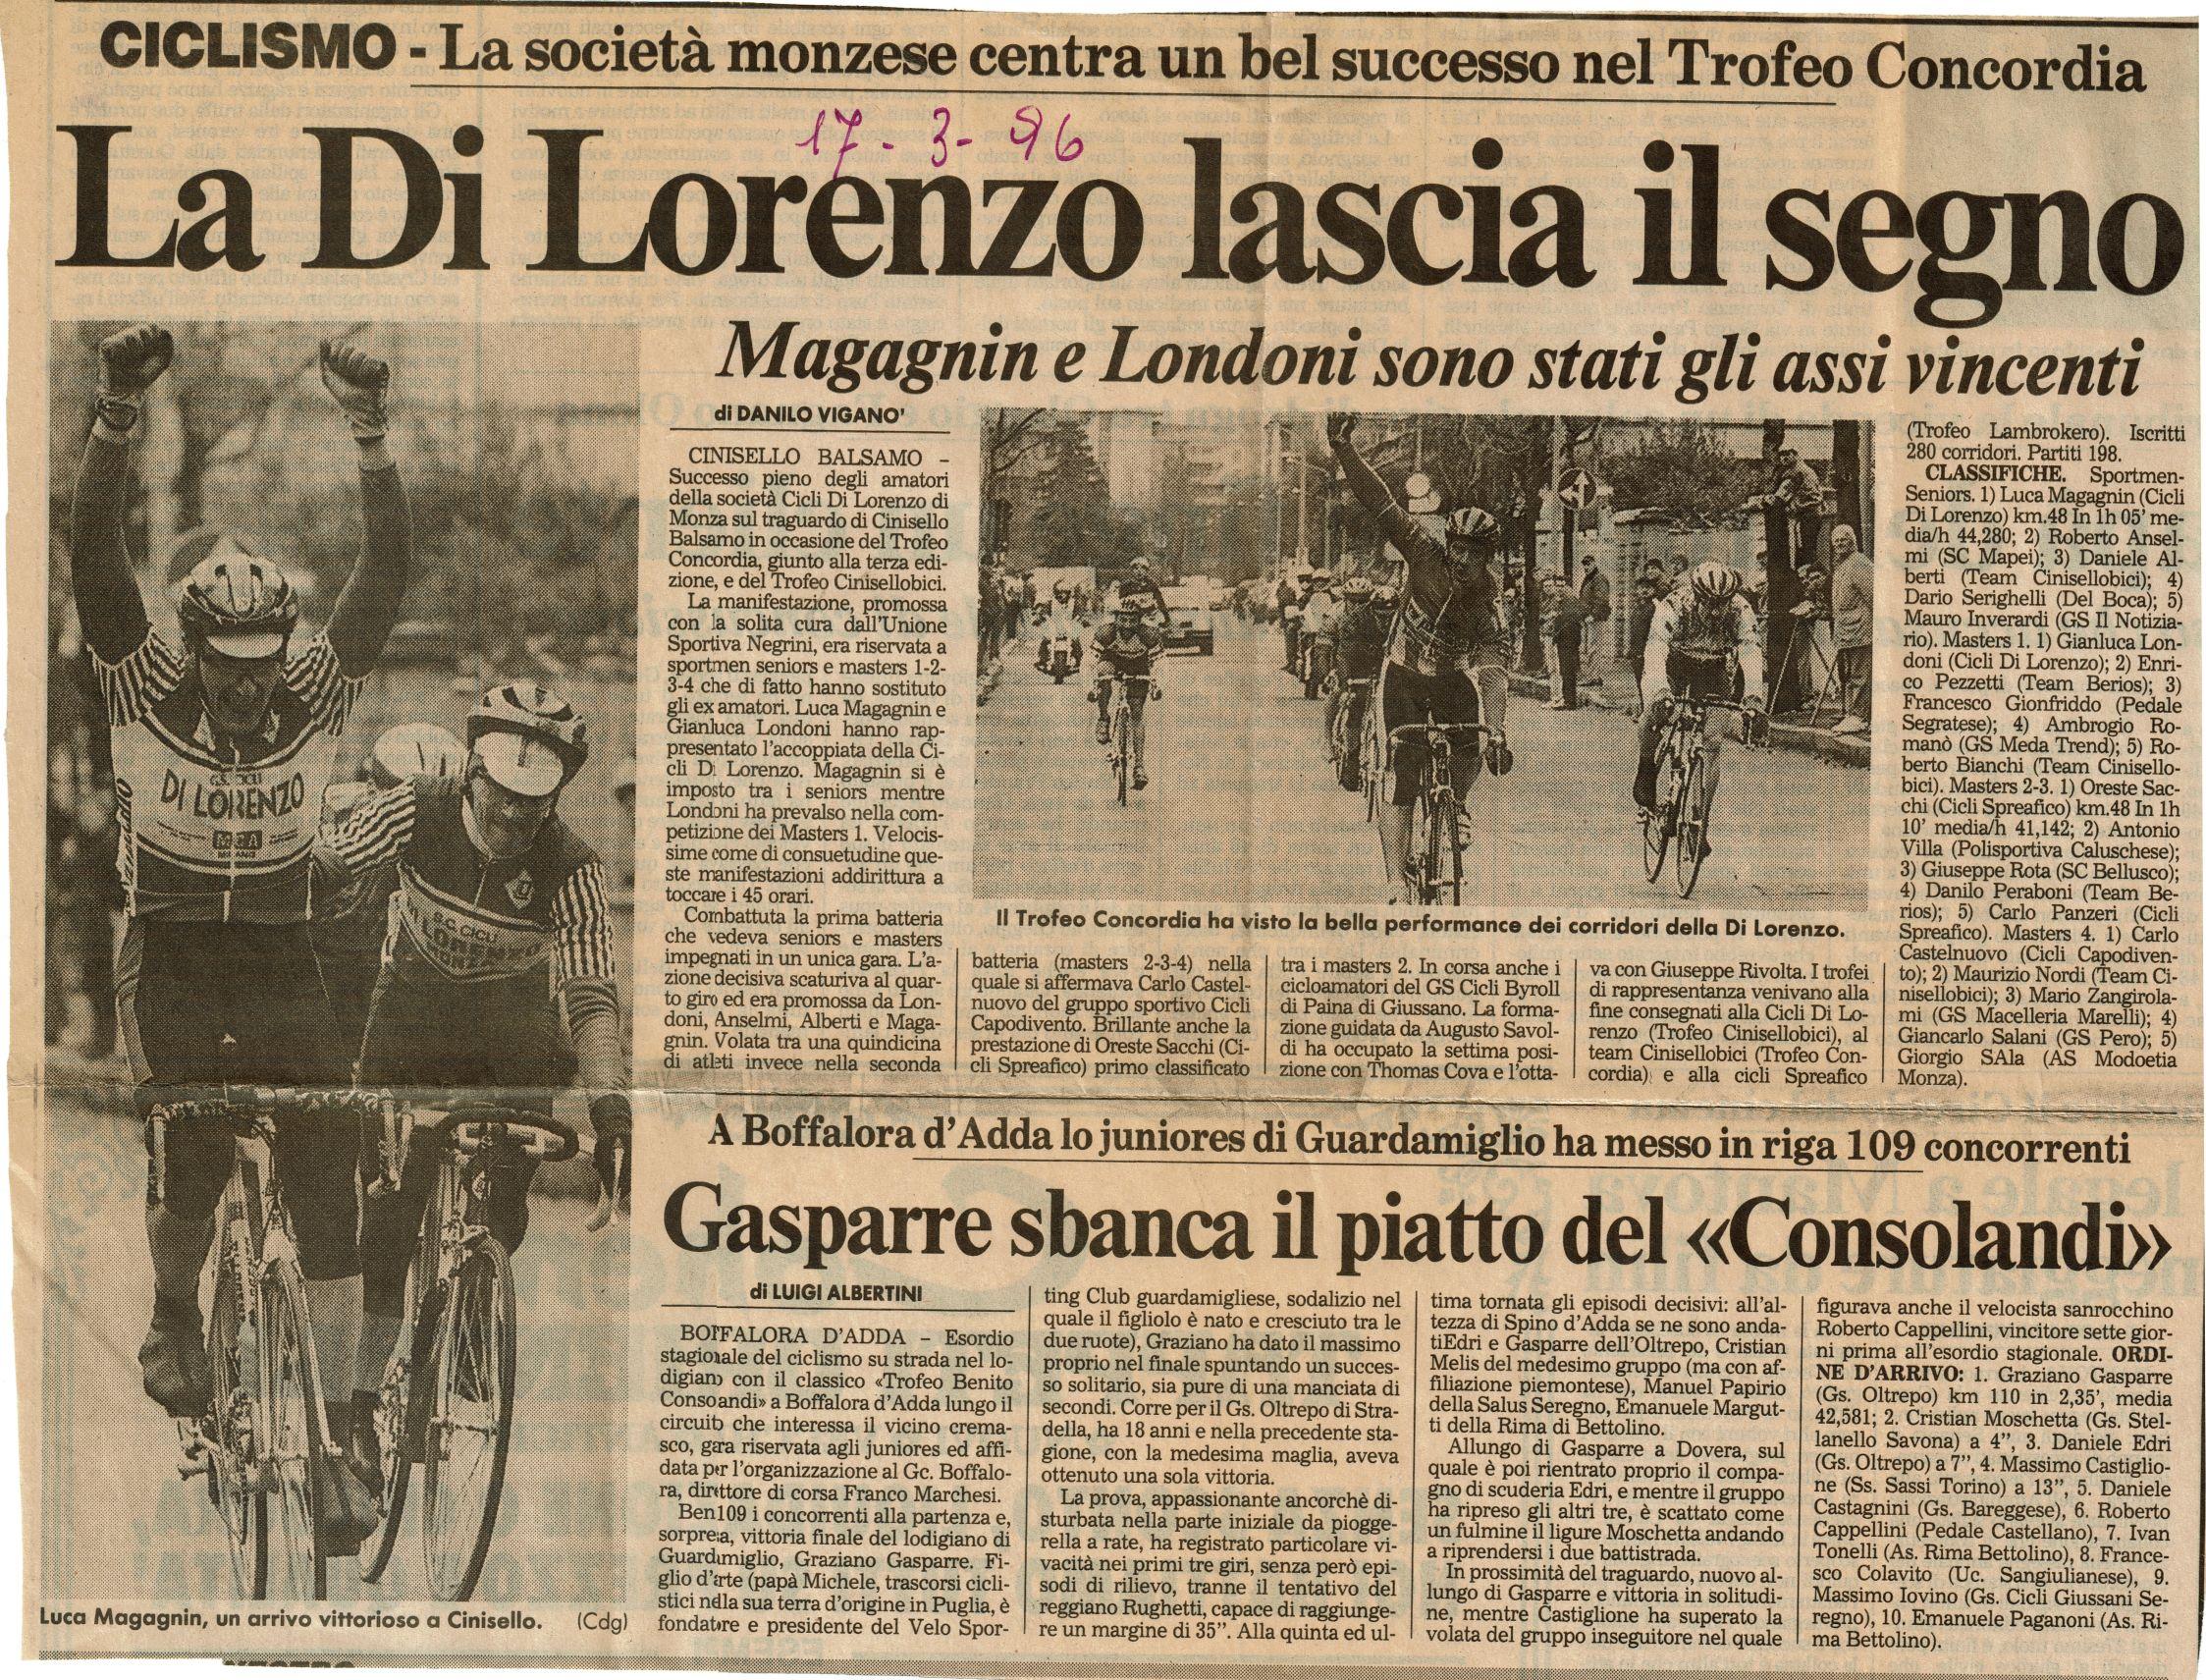 6 17 marzo 1996